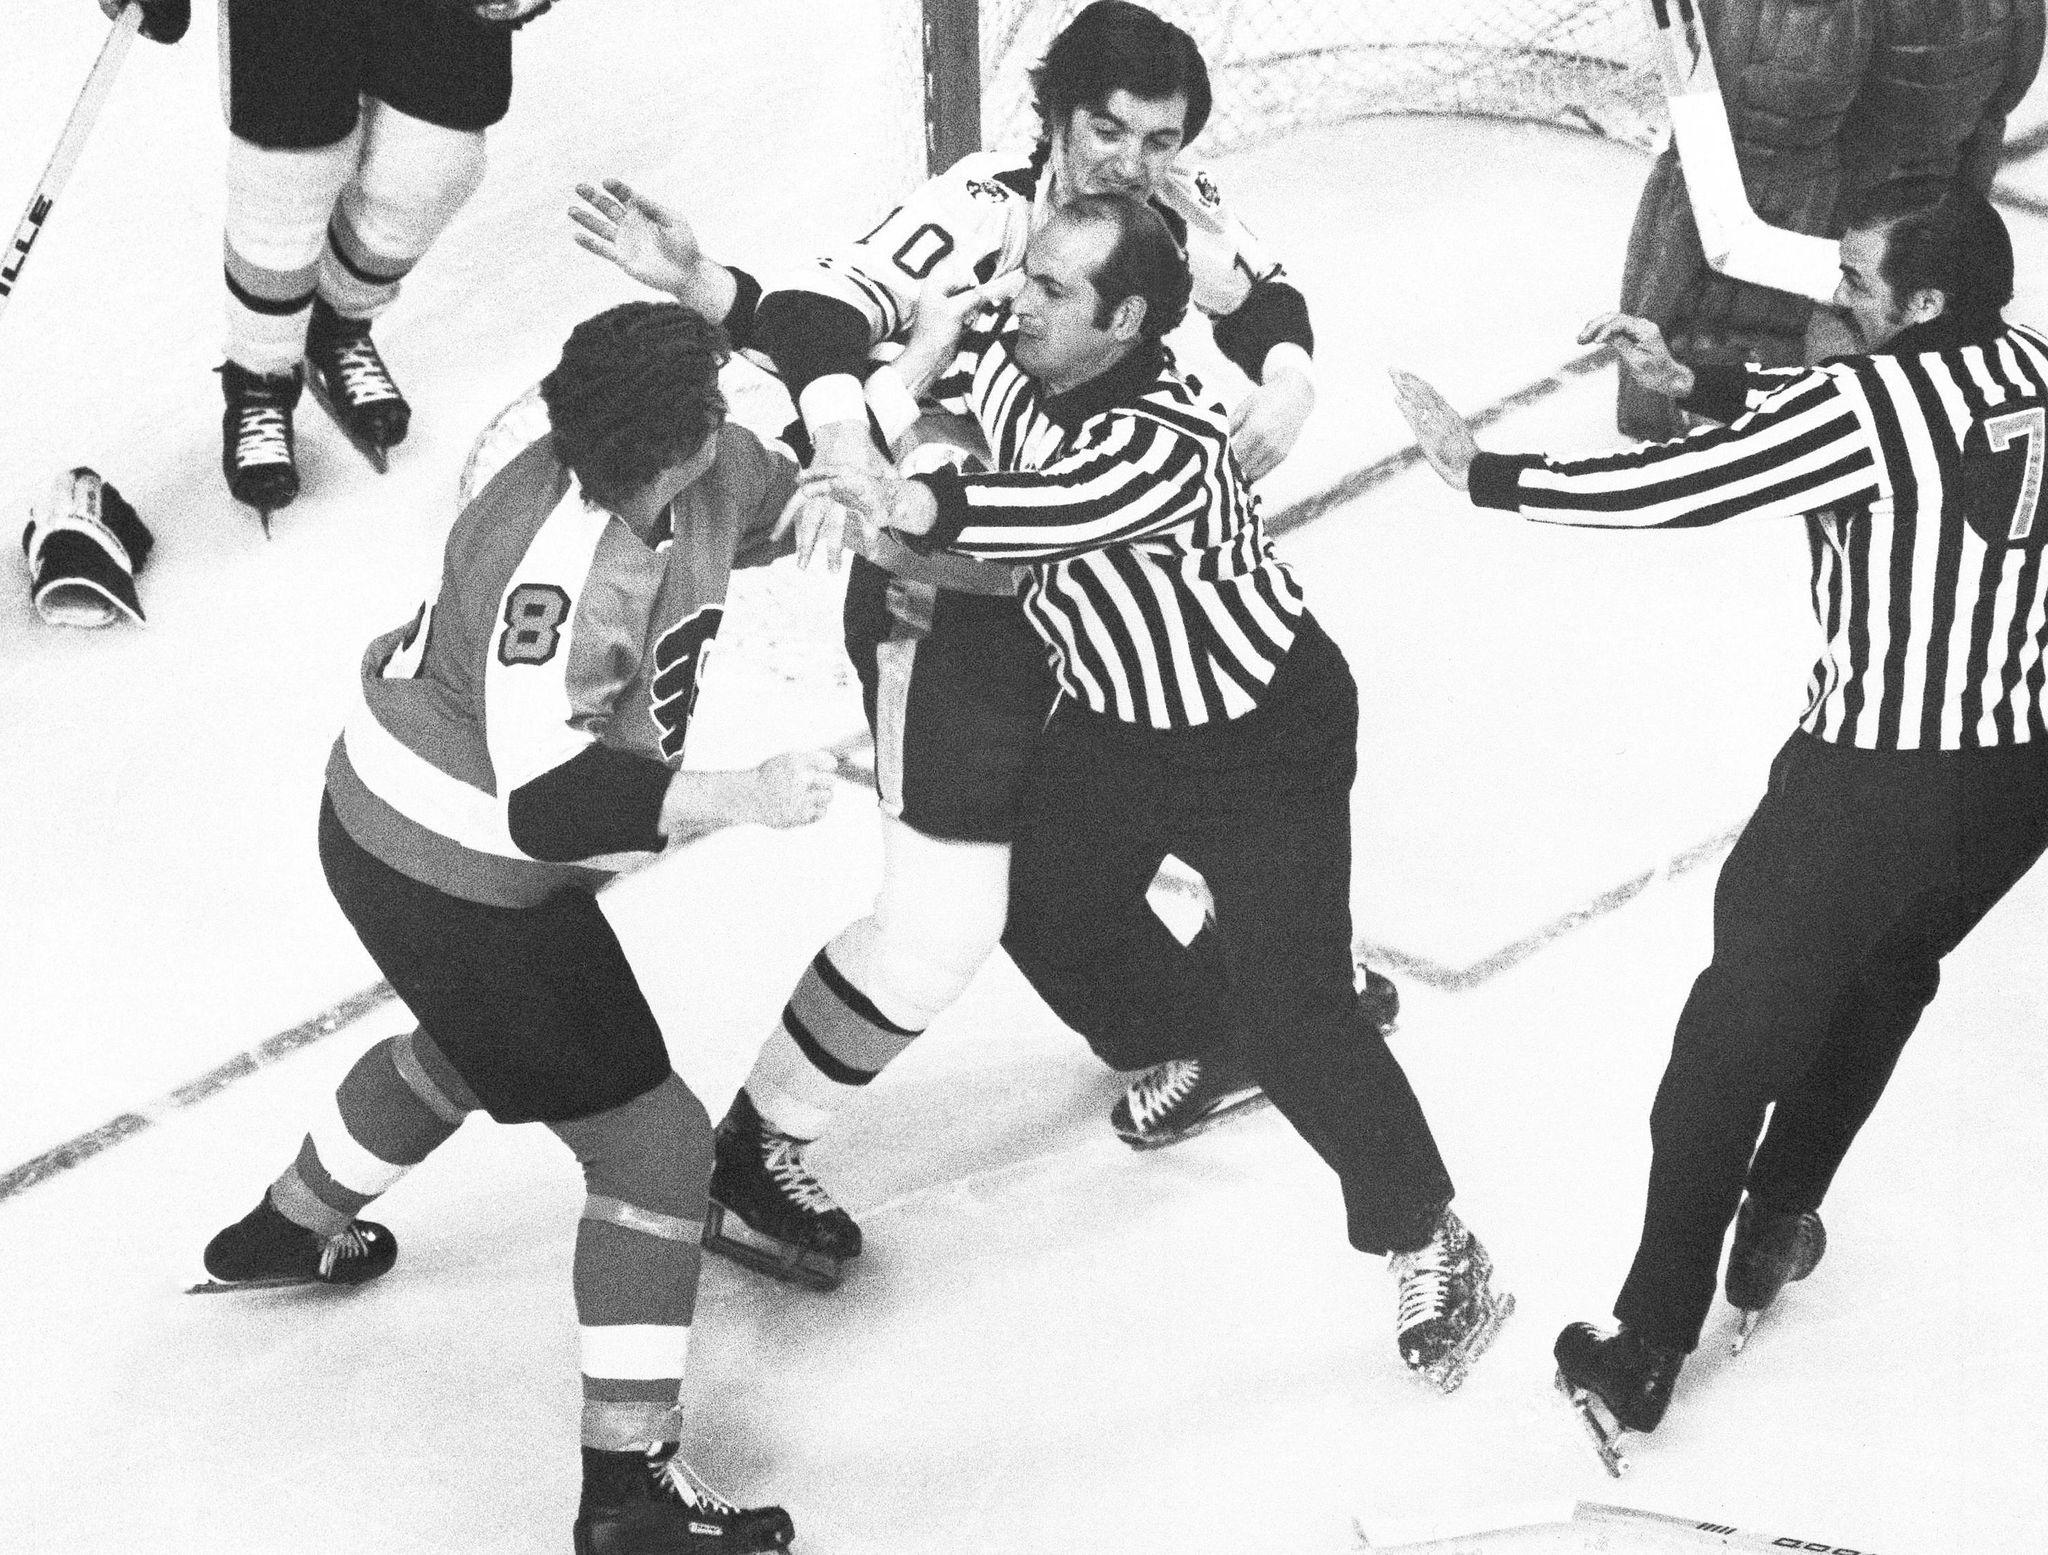 Fightless_flyers_hockey_23609_s2048x1555